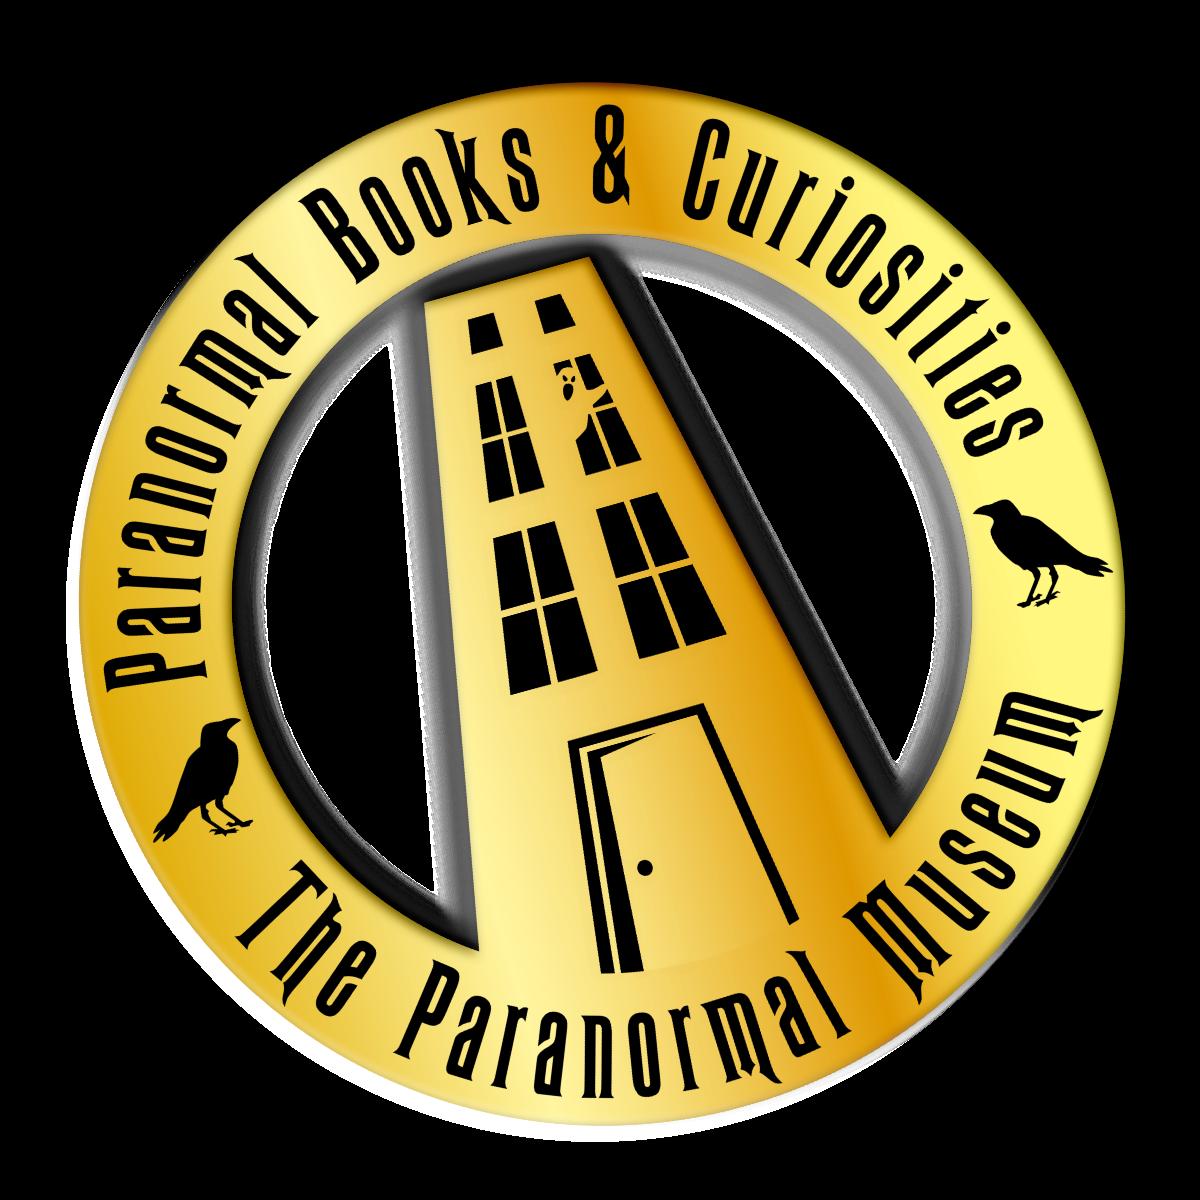 Paranormal Books NJ